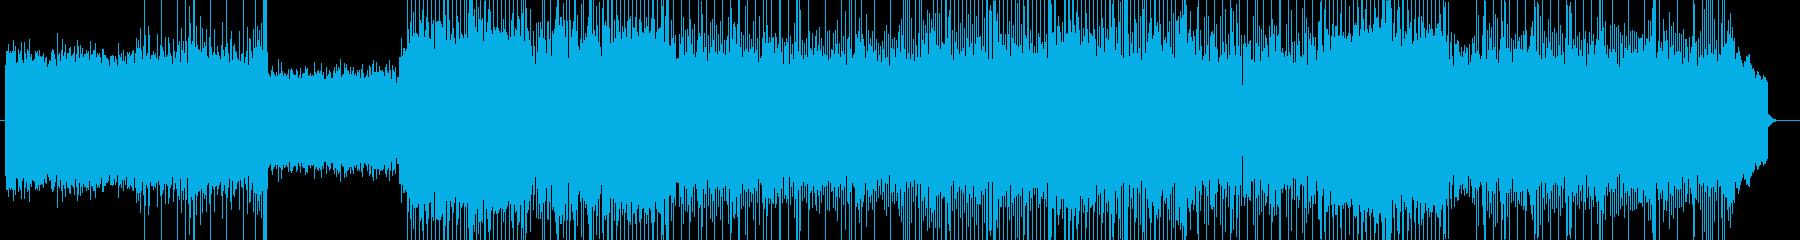 「HR/HM」「DARK」BGM125の再生済みの波形